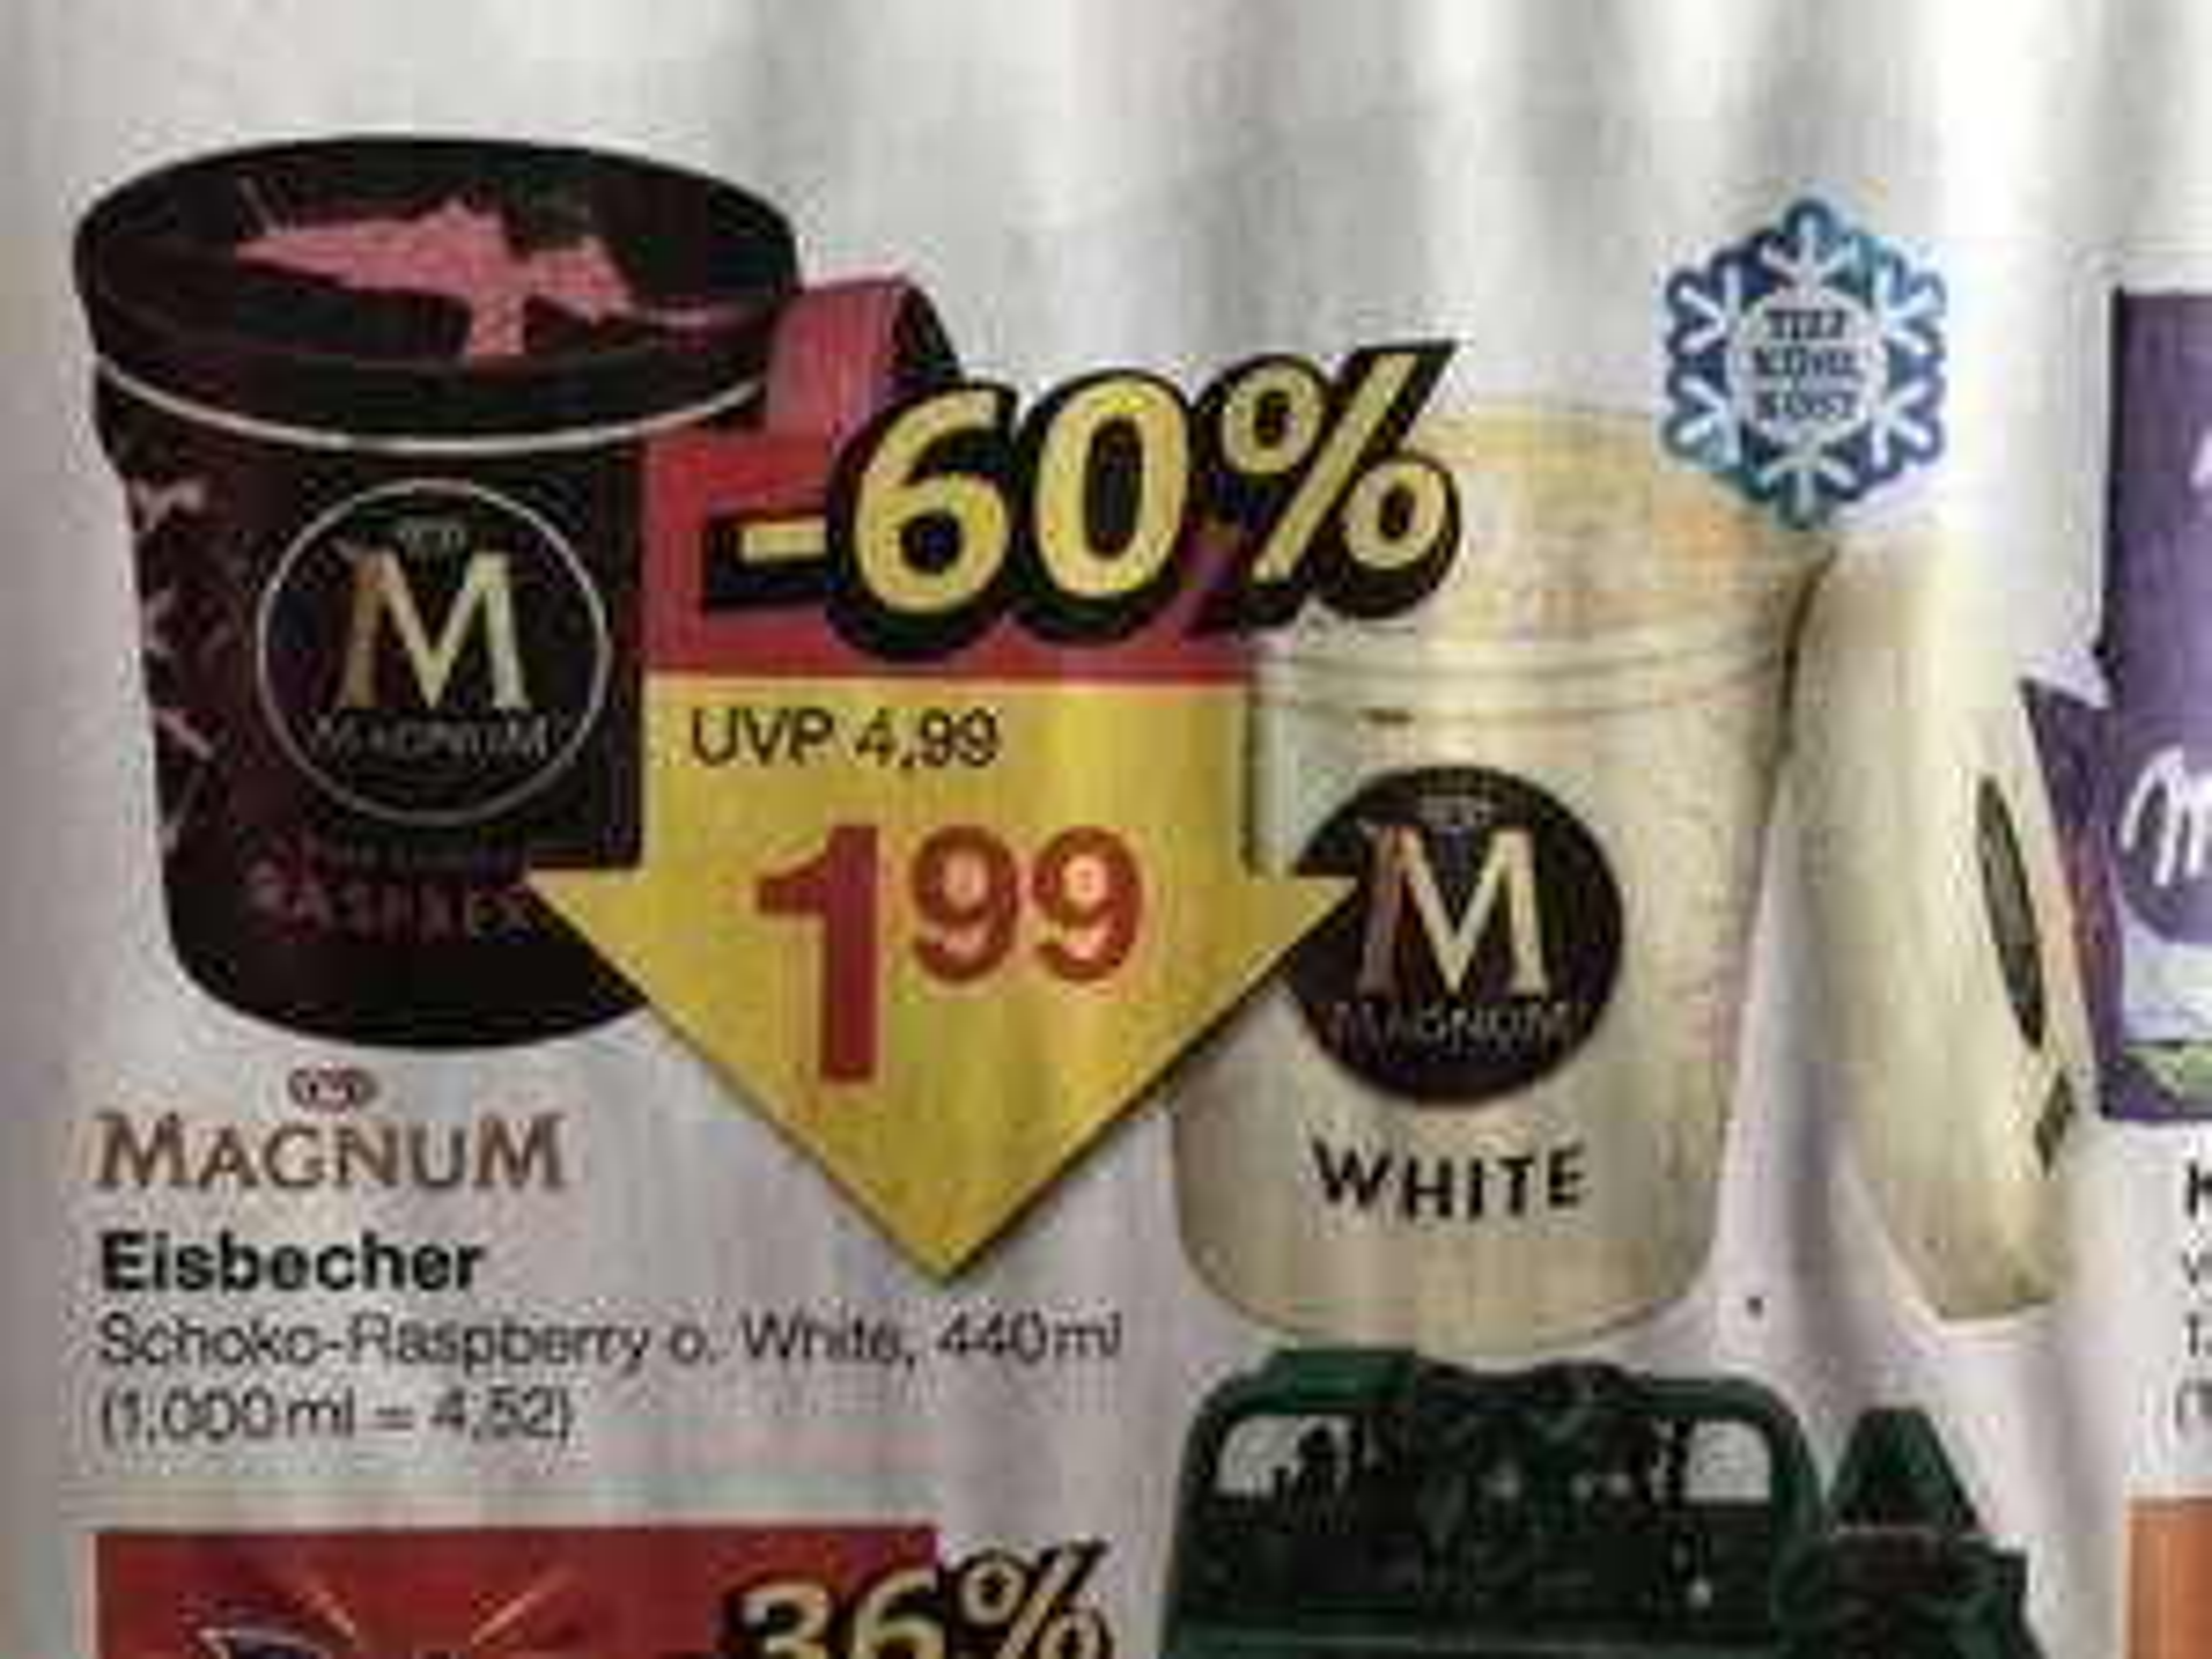 Magnum Eisbecher (440ml) Dark Chocolate Raspberry & White | Jawoll